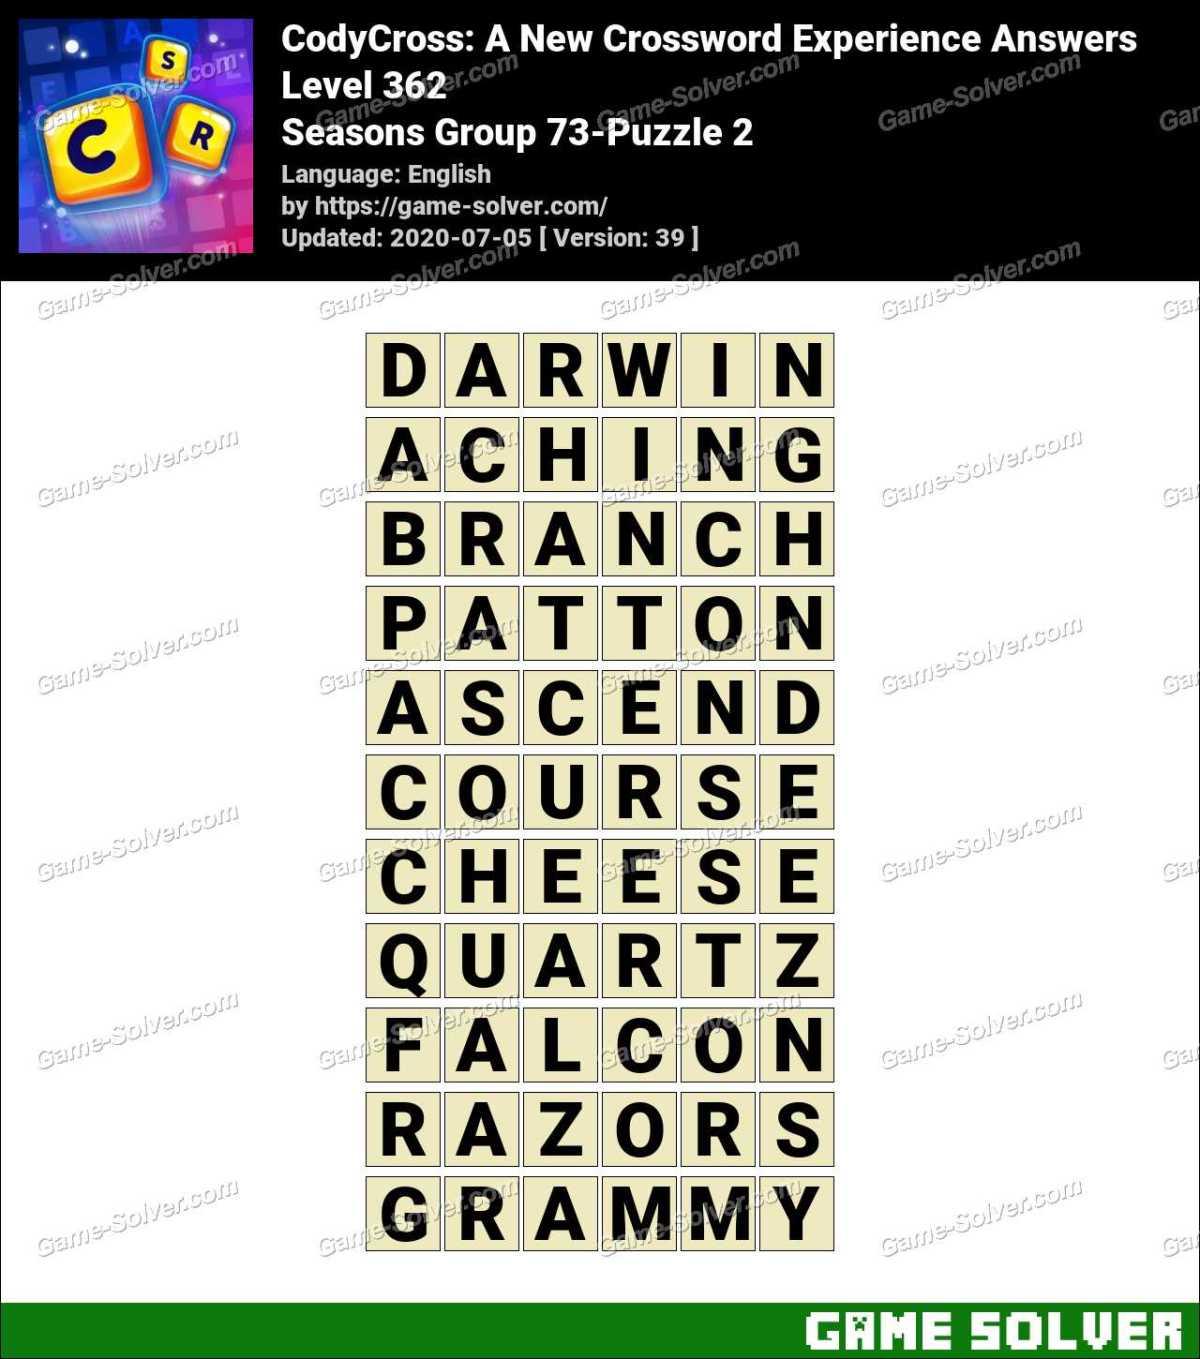 CodyCross Seasons Group 73-Puzzle 2 Answers